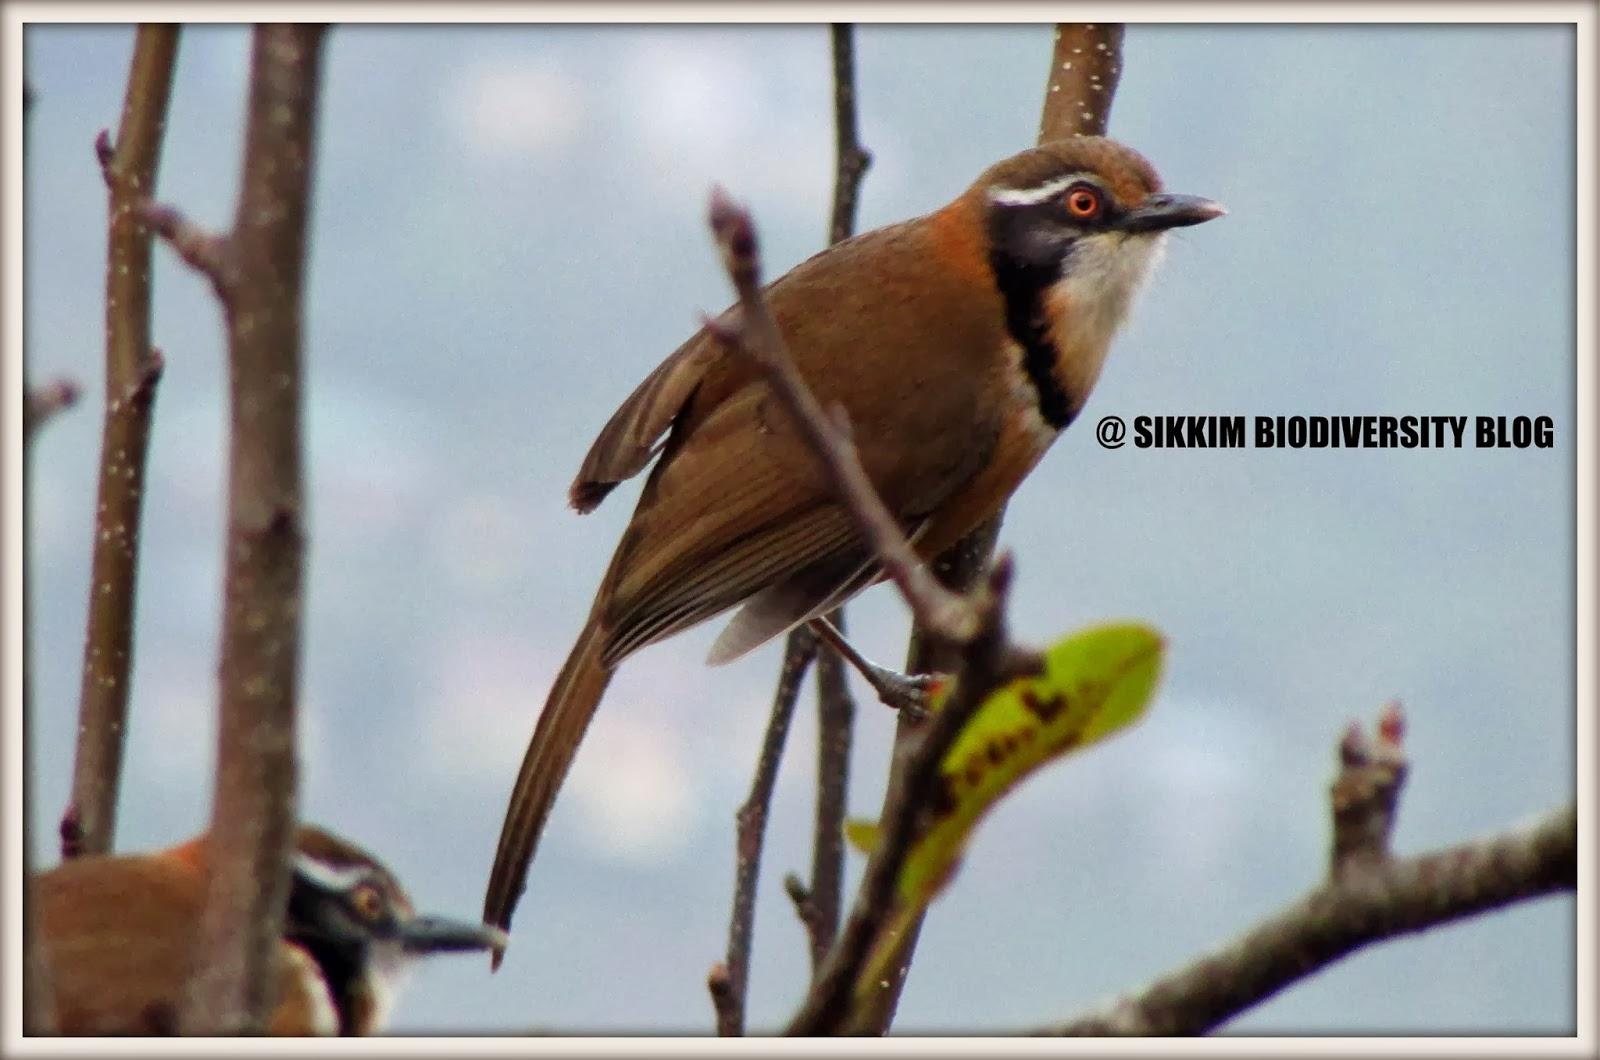 Sikkim Biodiversity Where Nature Smiles Garrulax Monileger Lesser Necklaced Laughingthrush Sikkim Bird